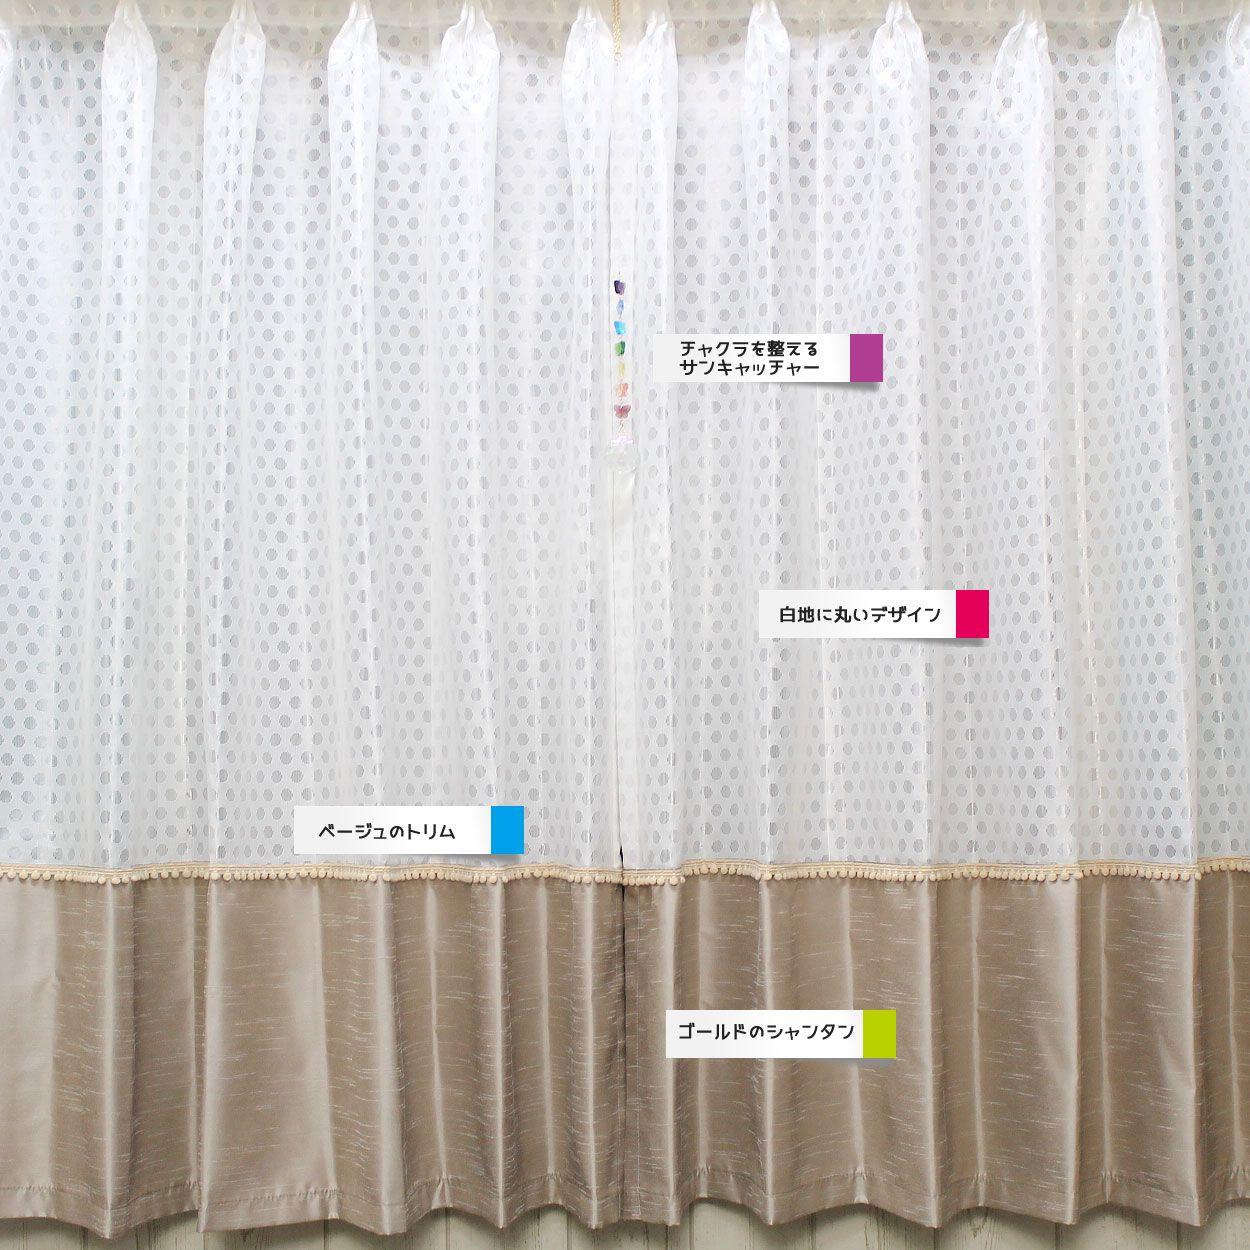 Feng Shui Curtain 開運カーテン ホワイト 丸いお金をイメージする白 金 銀系デザイン カーテン シャンタン 生地 カーテン 丈